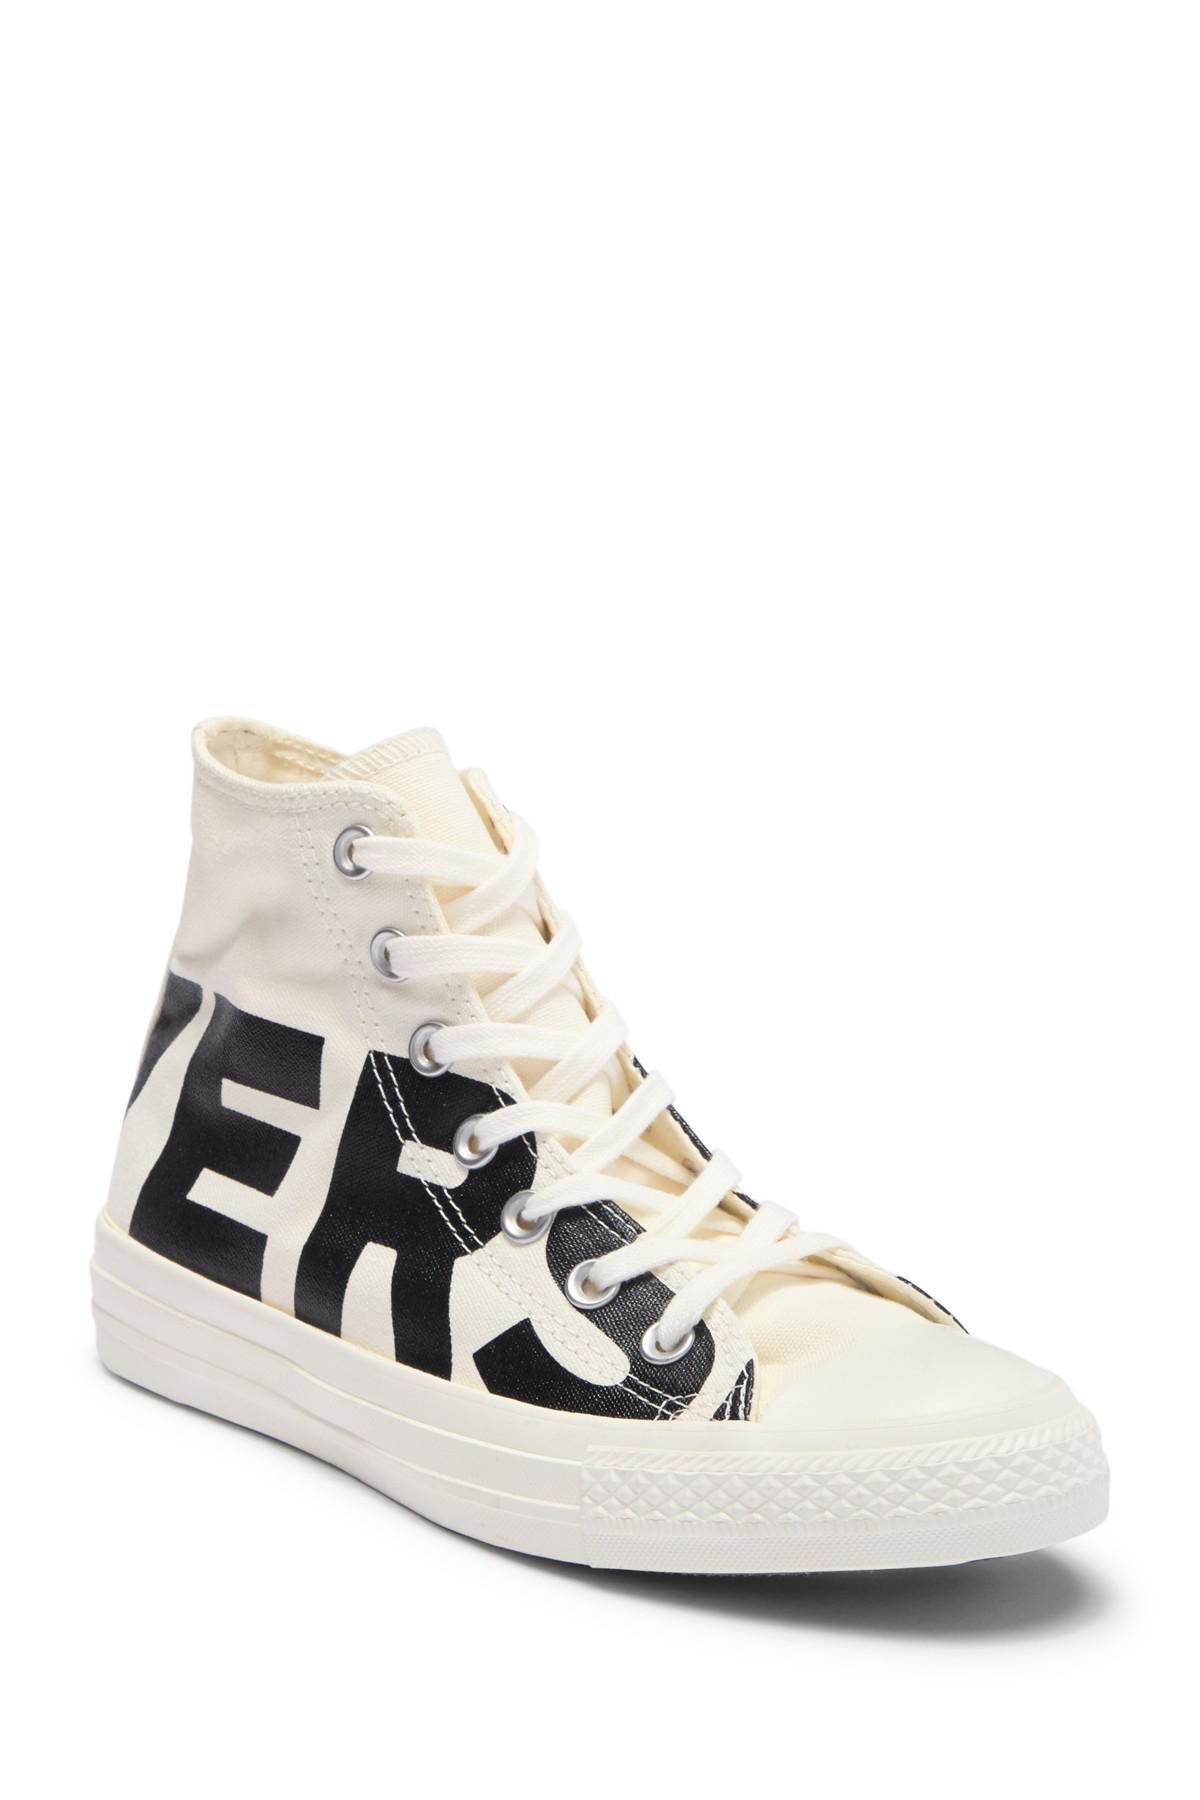 e90530ba8dc3 Lyst - Converse Chuck Taylor All Star High Top Sneaker (unisex) for Men